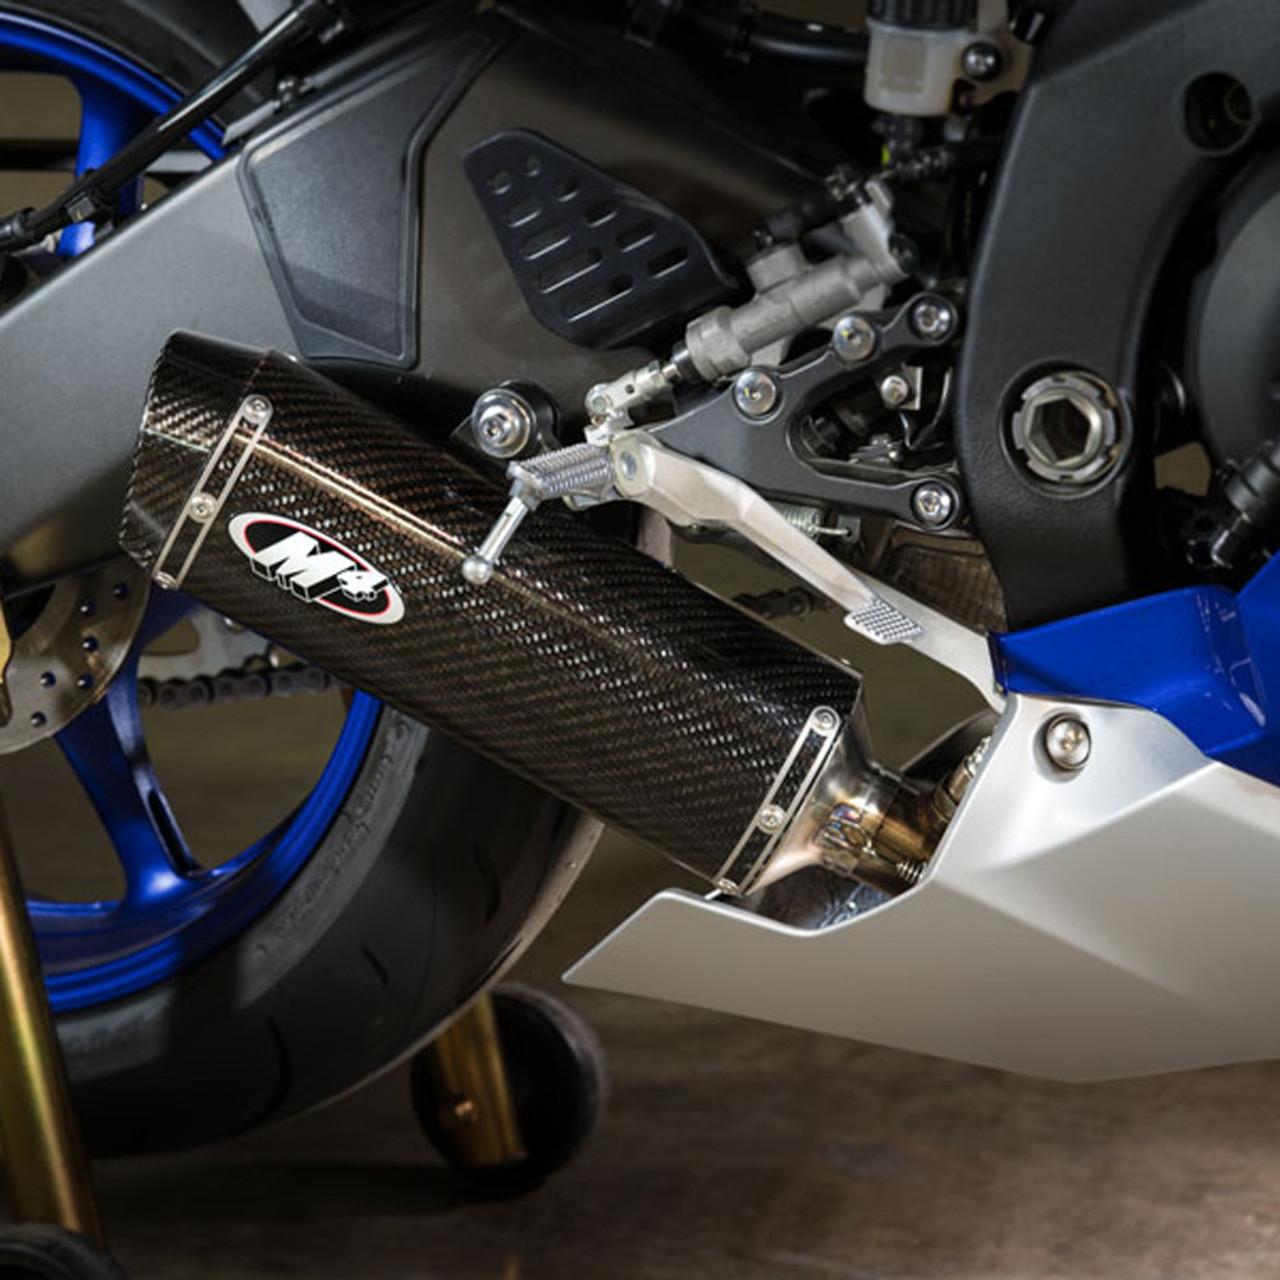 Top 10 Exhausts For The Yamaha R6 - MotorcycleDojo